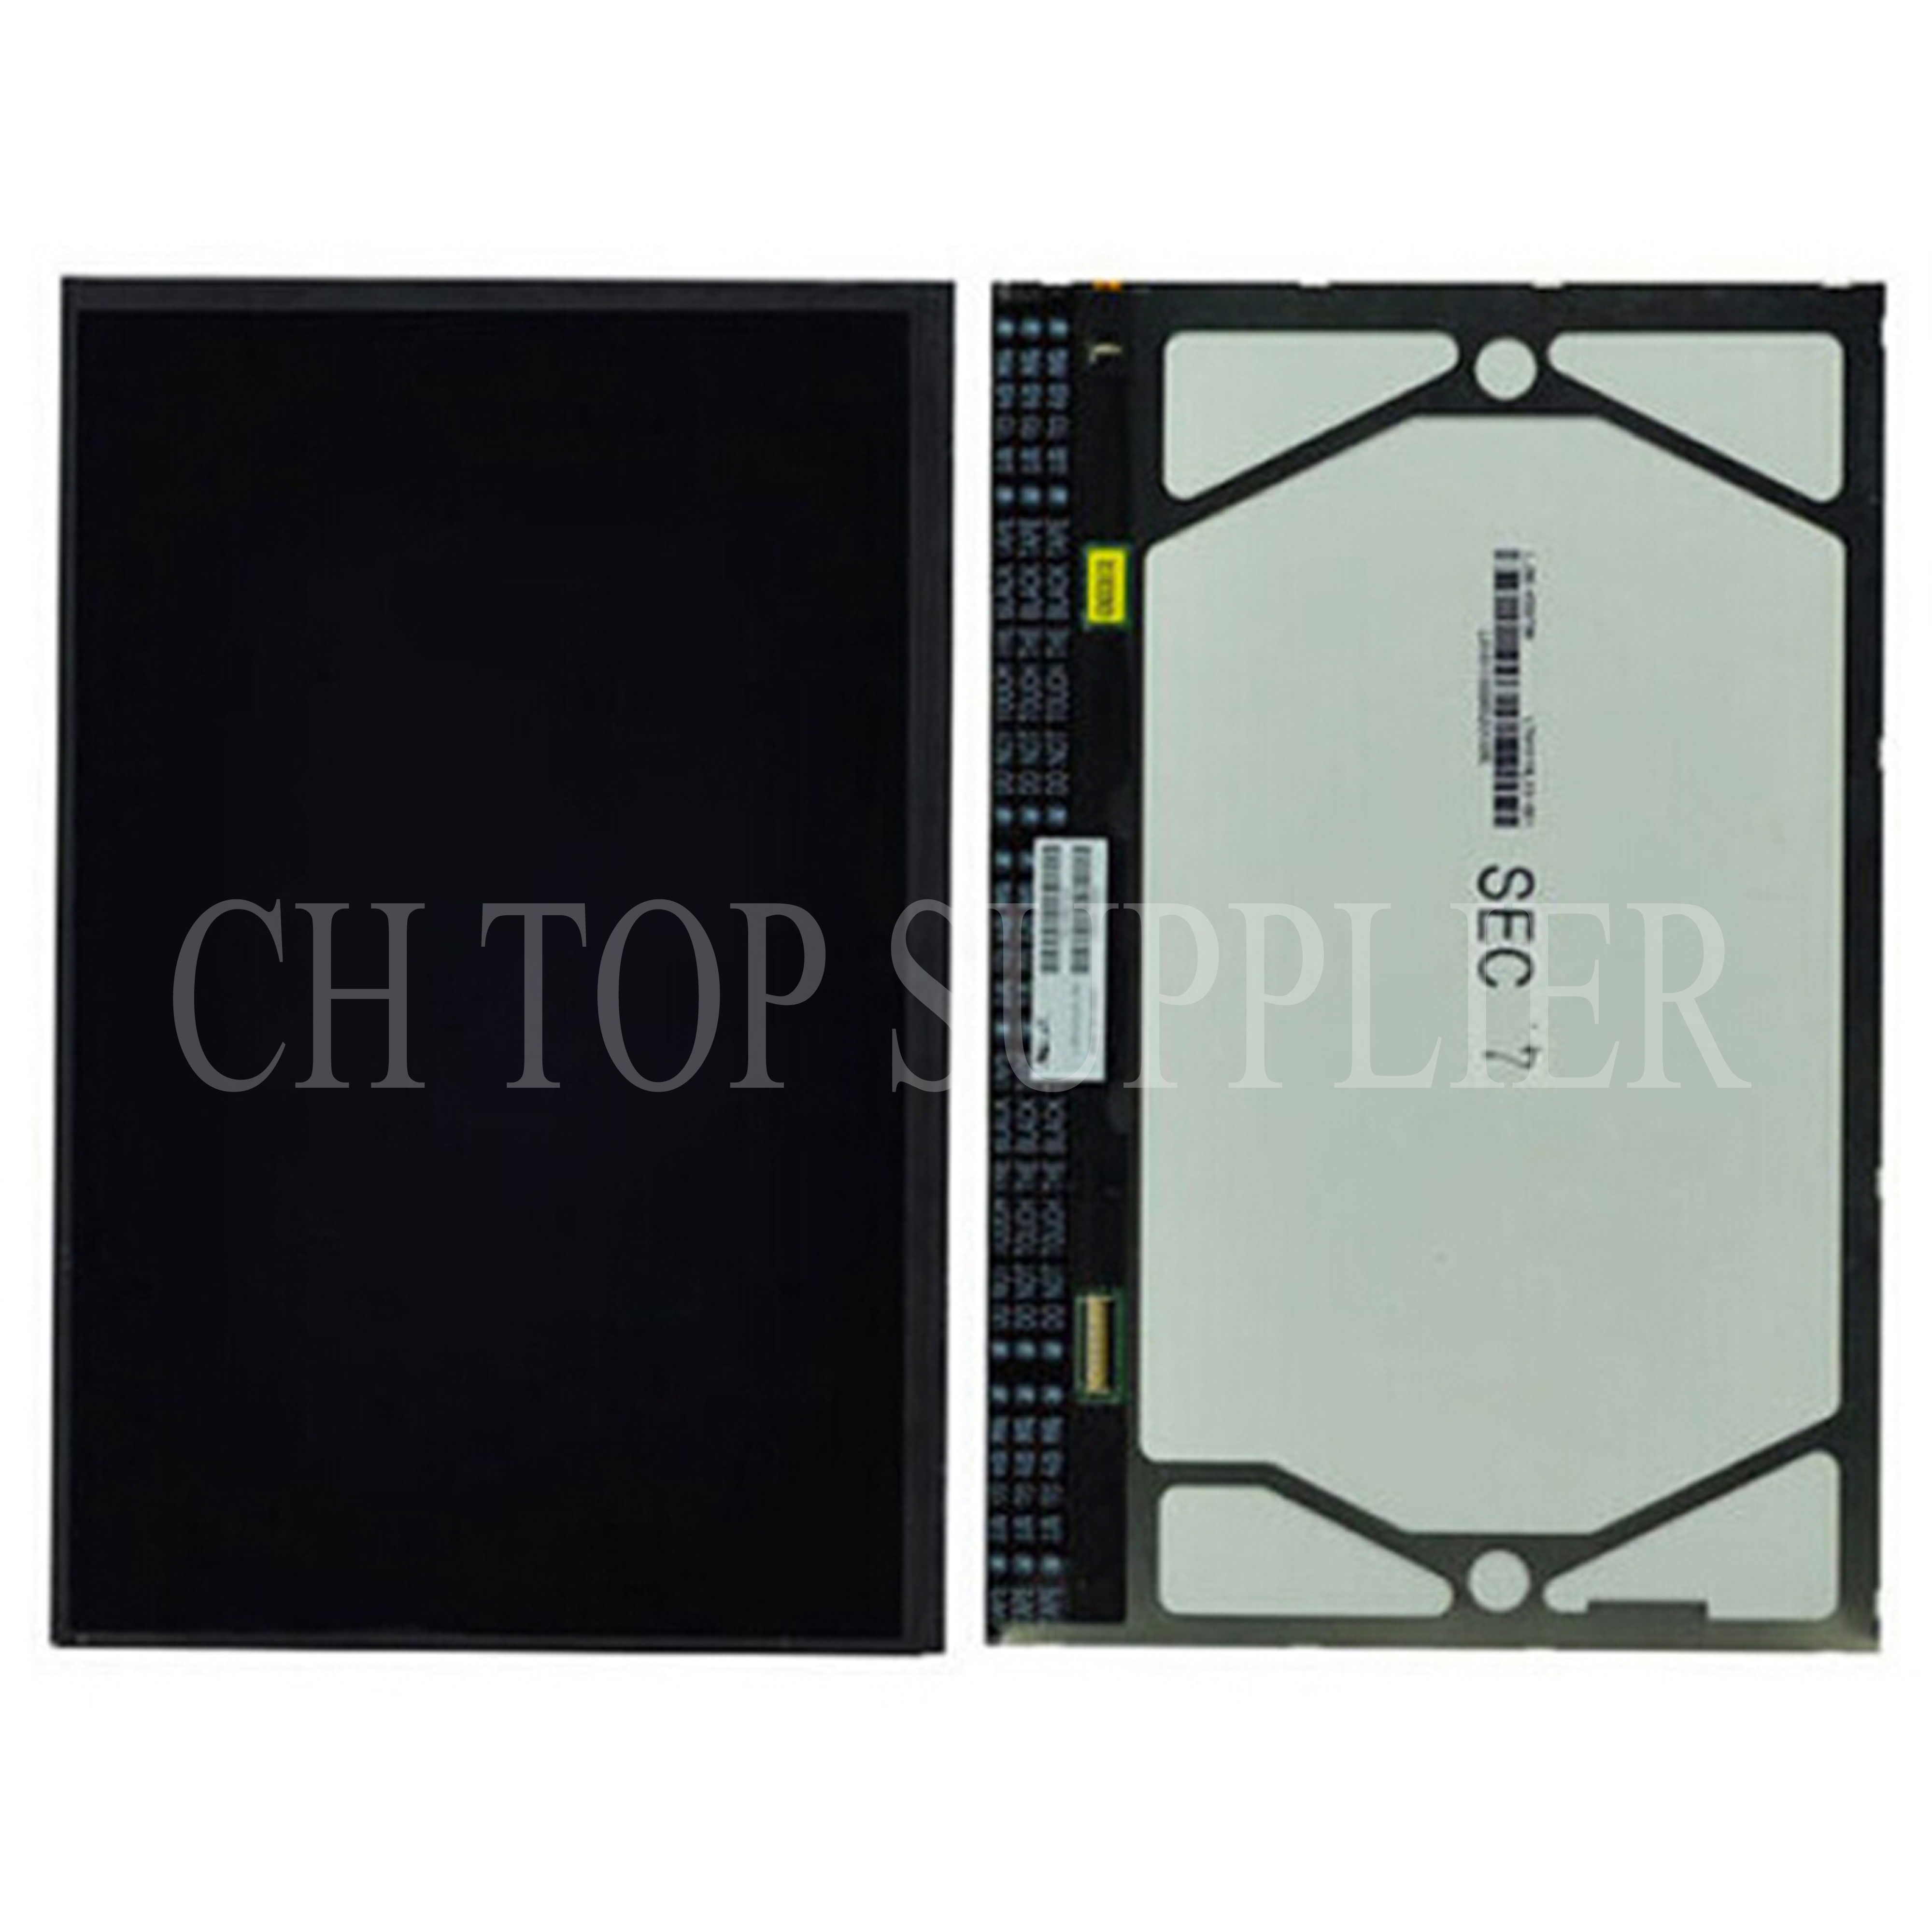 Original 10.1'' inch LCD screen LTL101AL06-003 for tablet pc LCD display free shipping original 10 1inch lcd screen vvx10t022n00 for tablet pc free shipping